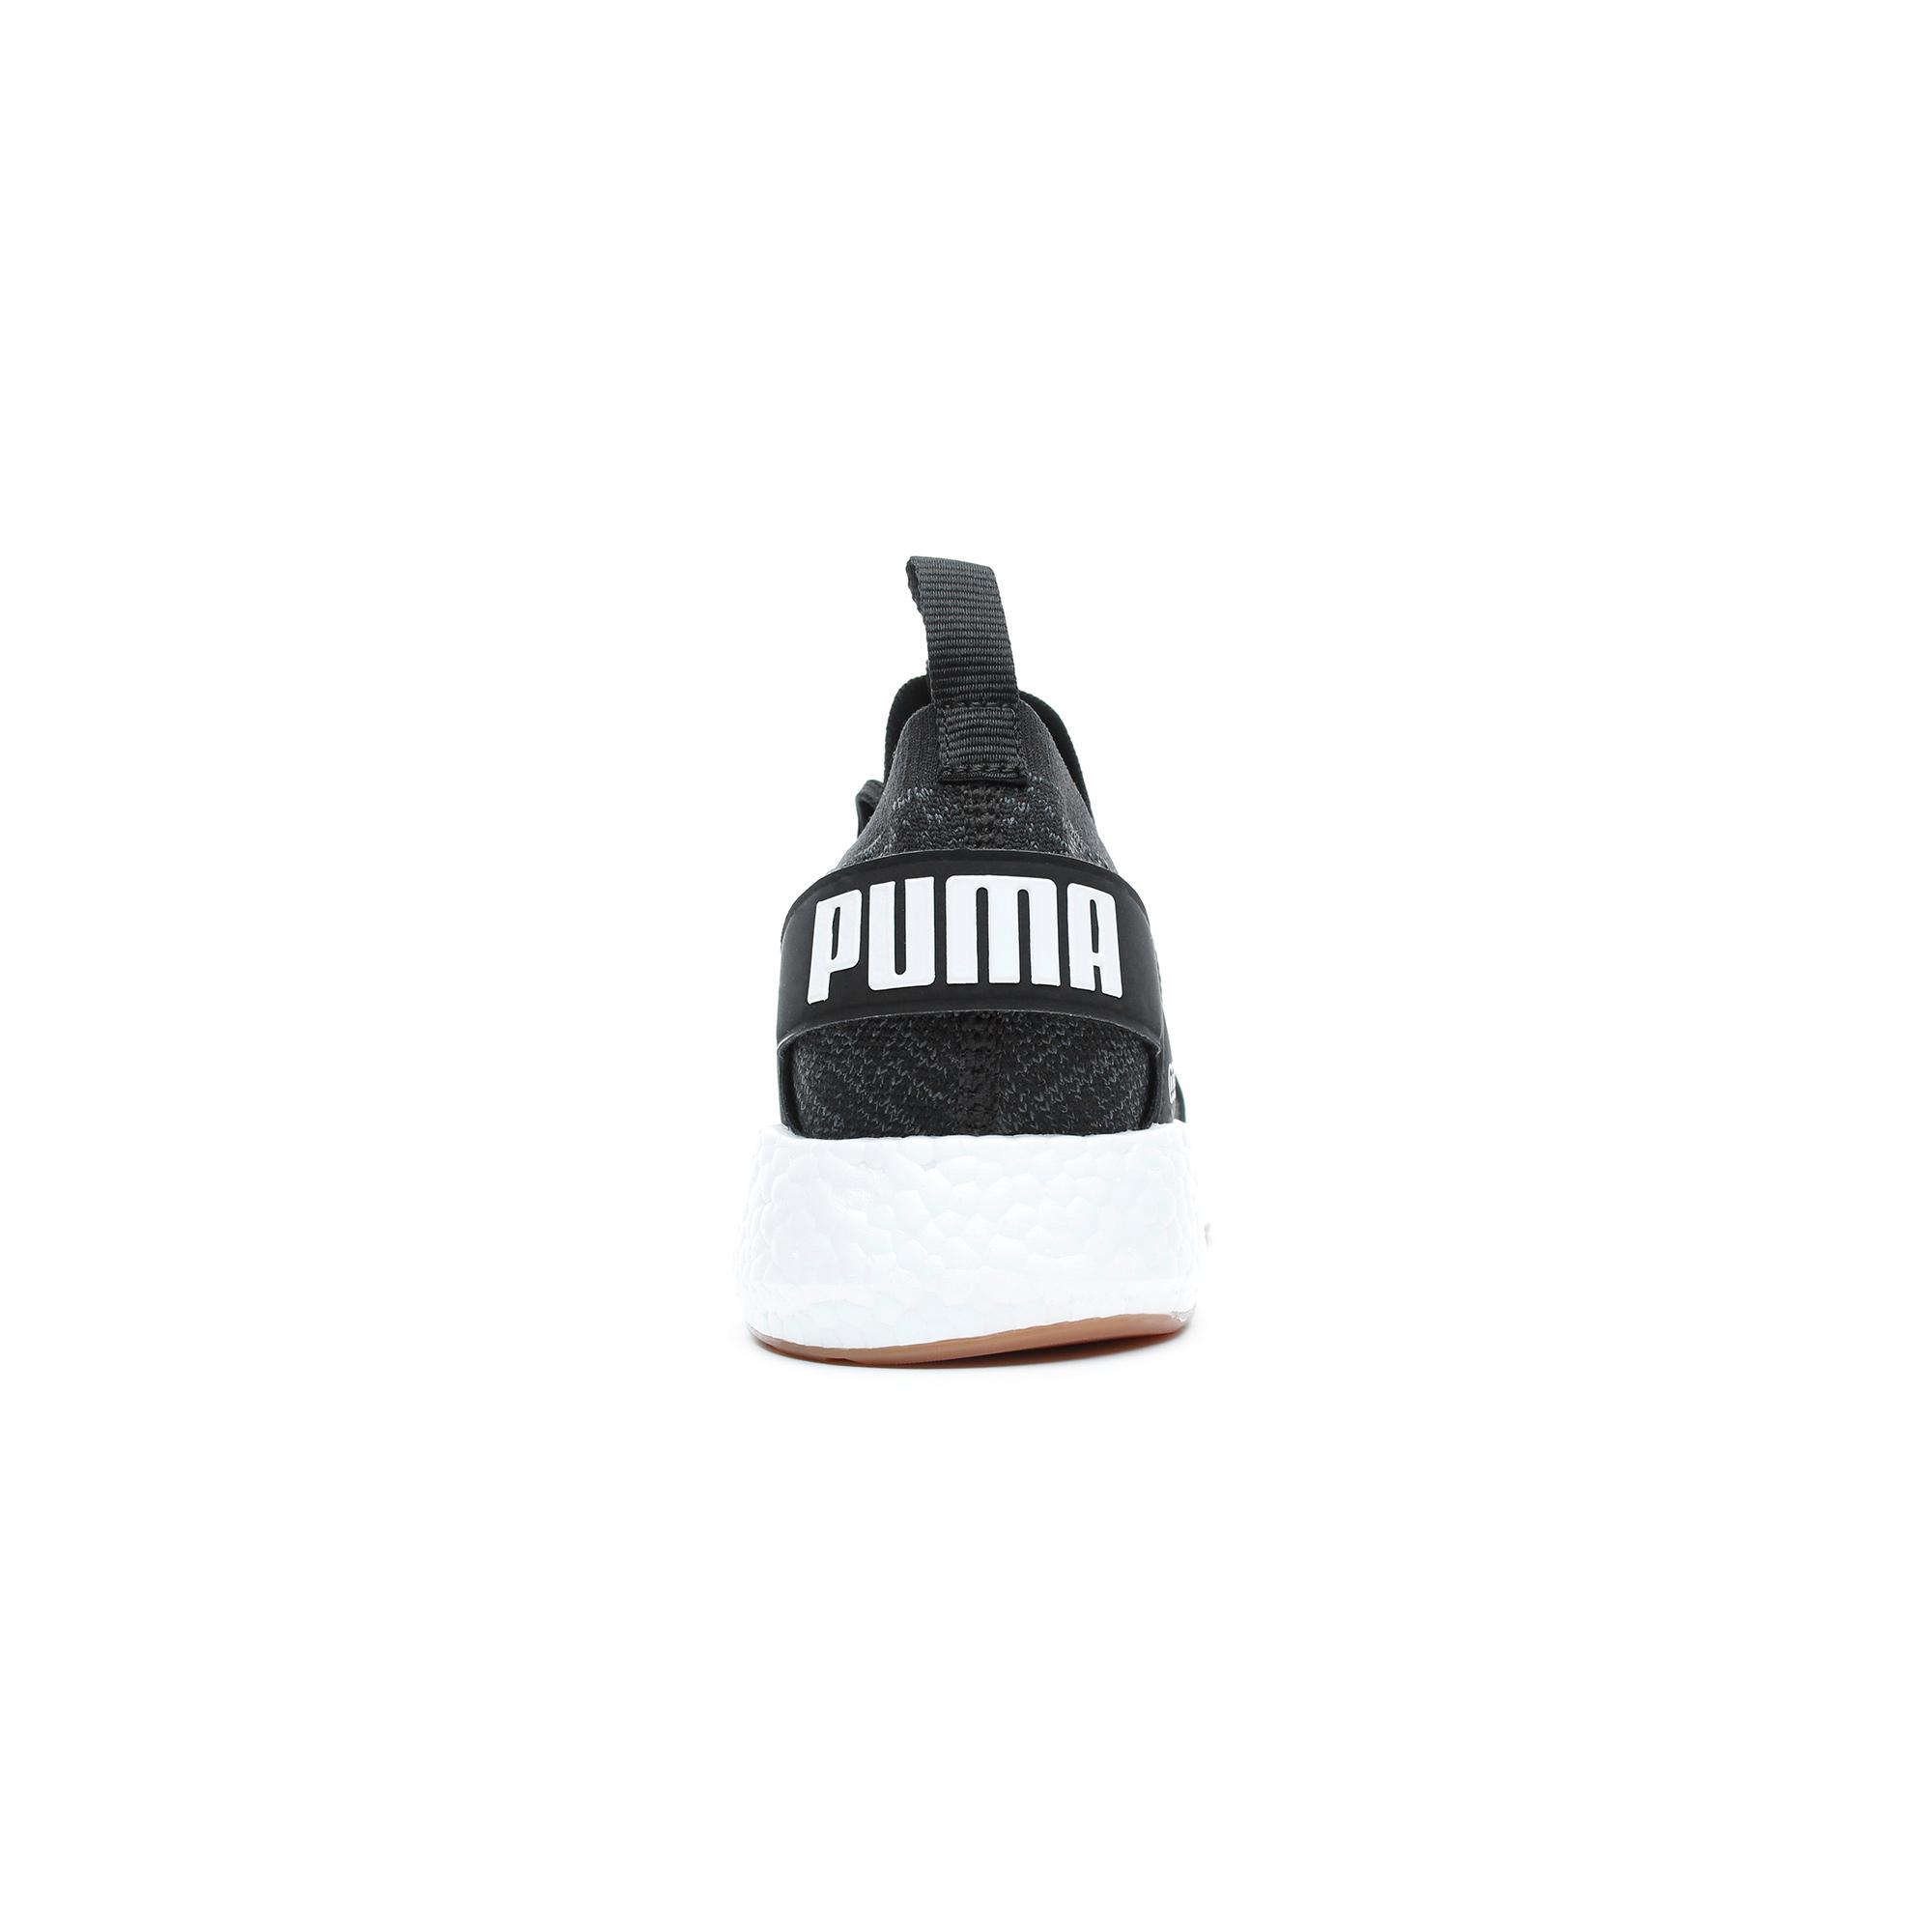 Puma NRGY Neko Engineer Knit Erkek Siyah Spor Ayakkabı